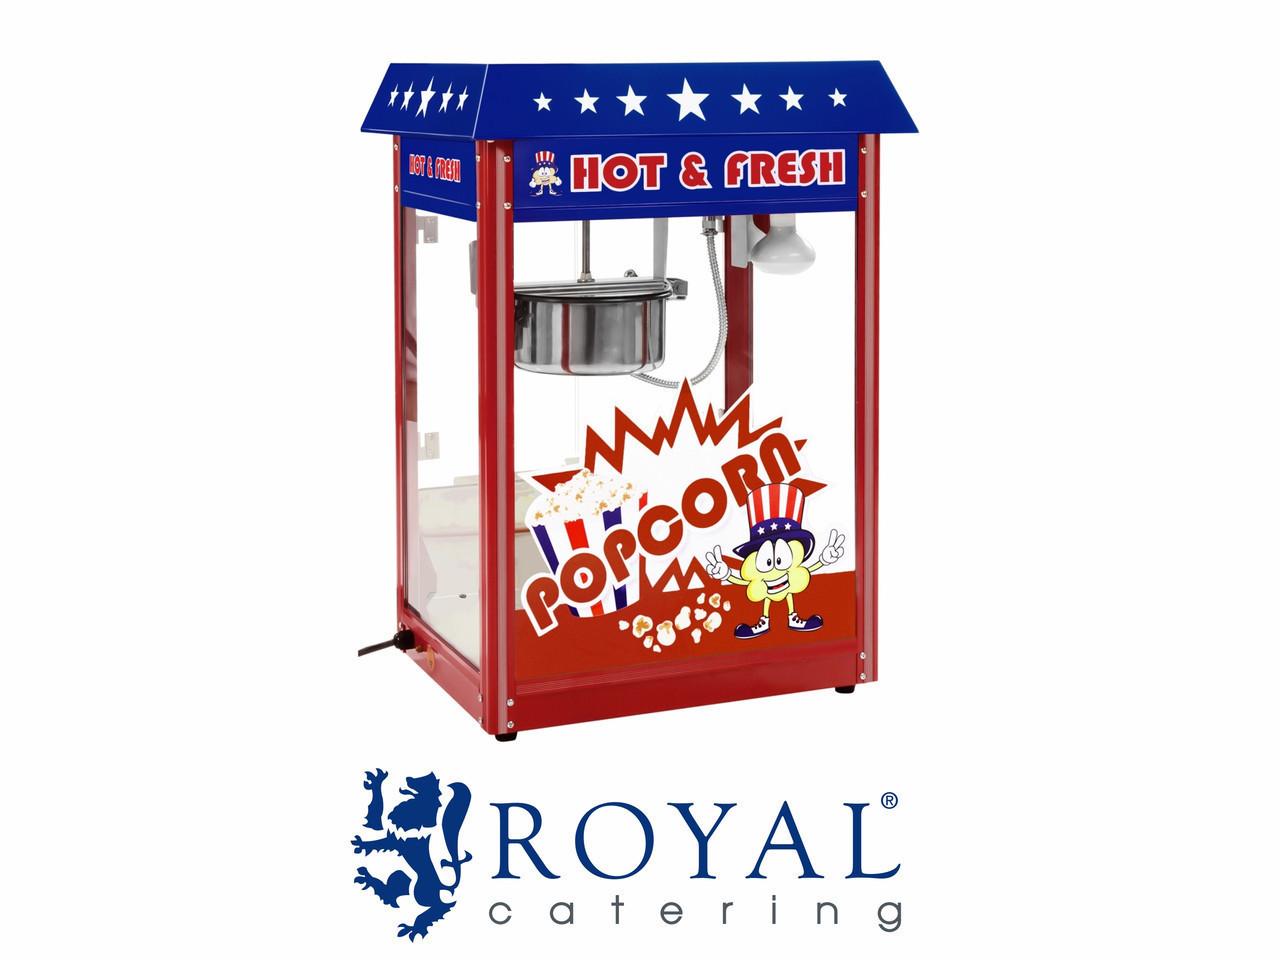 Машина для попкорна ROYAL